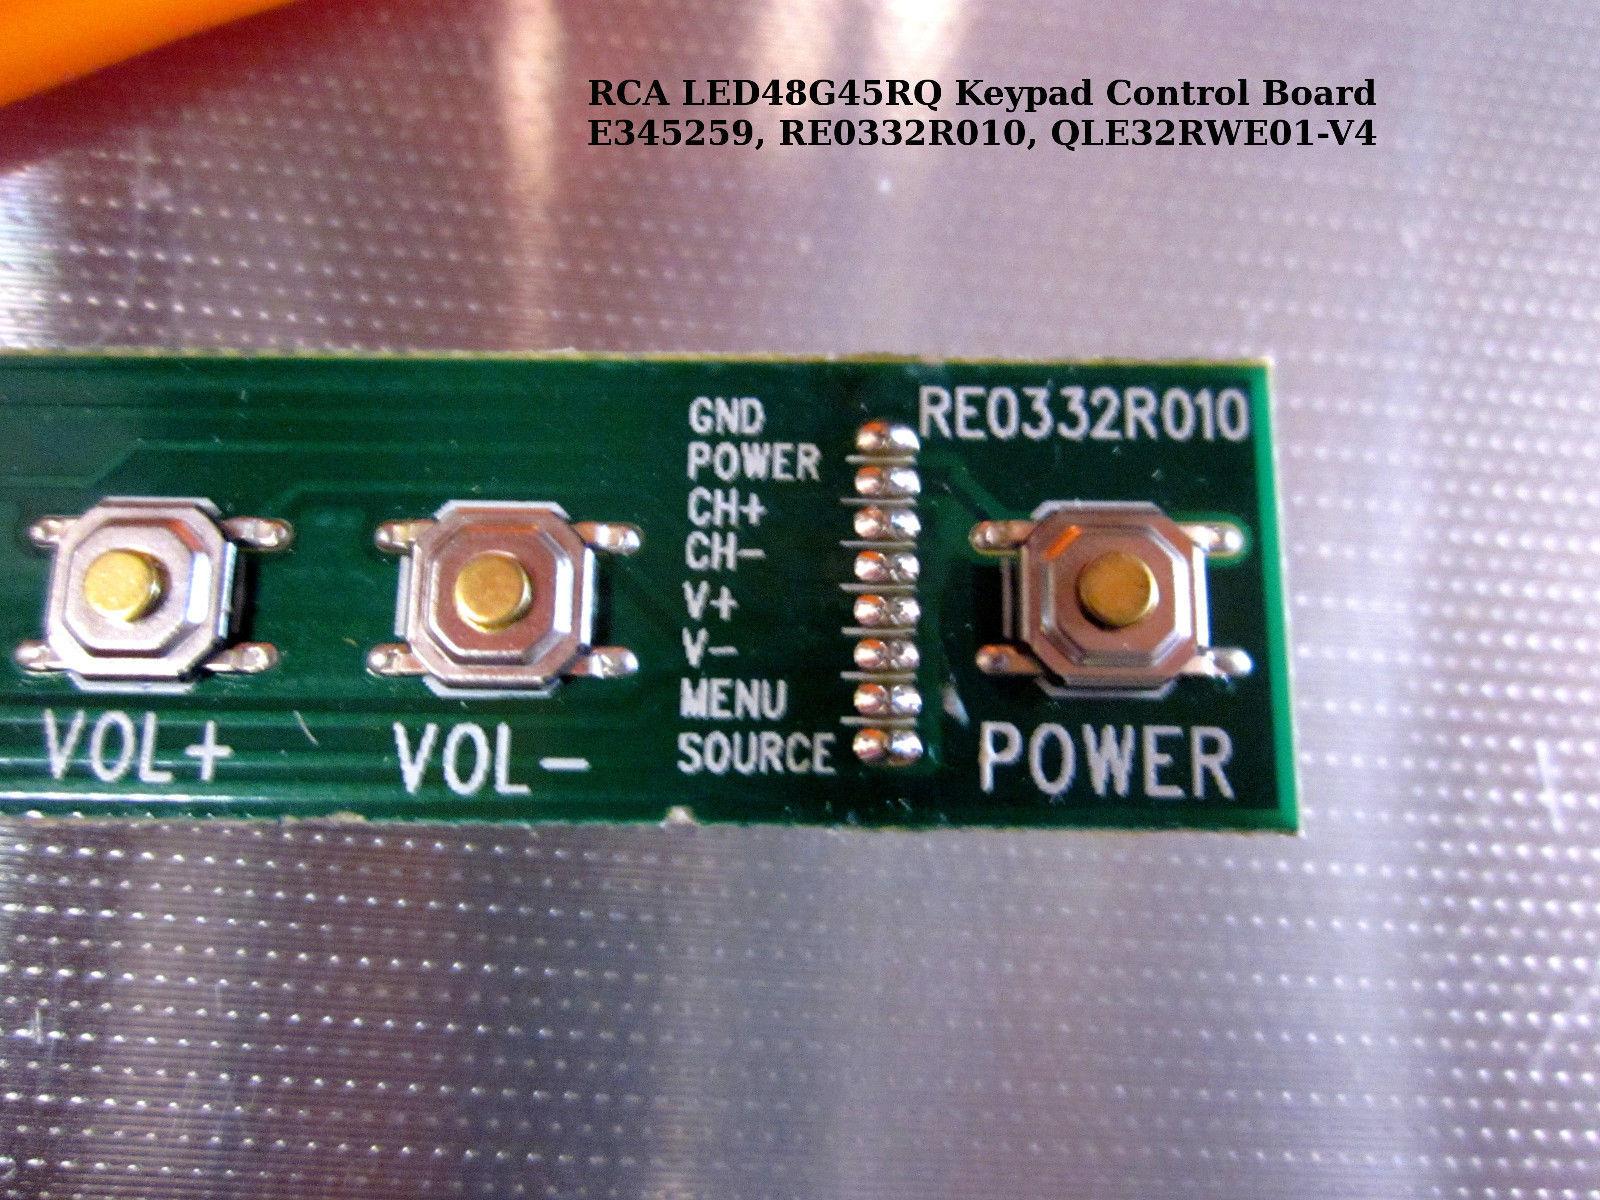 RCA LED48G45RQ Keypad Control Board E345259, RE0332R010, QLE32RWE01-V4